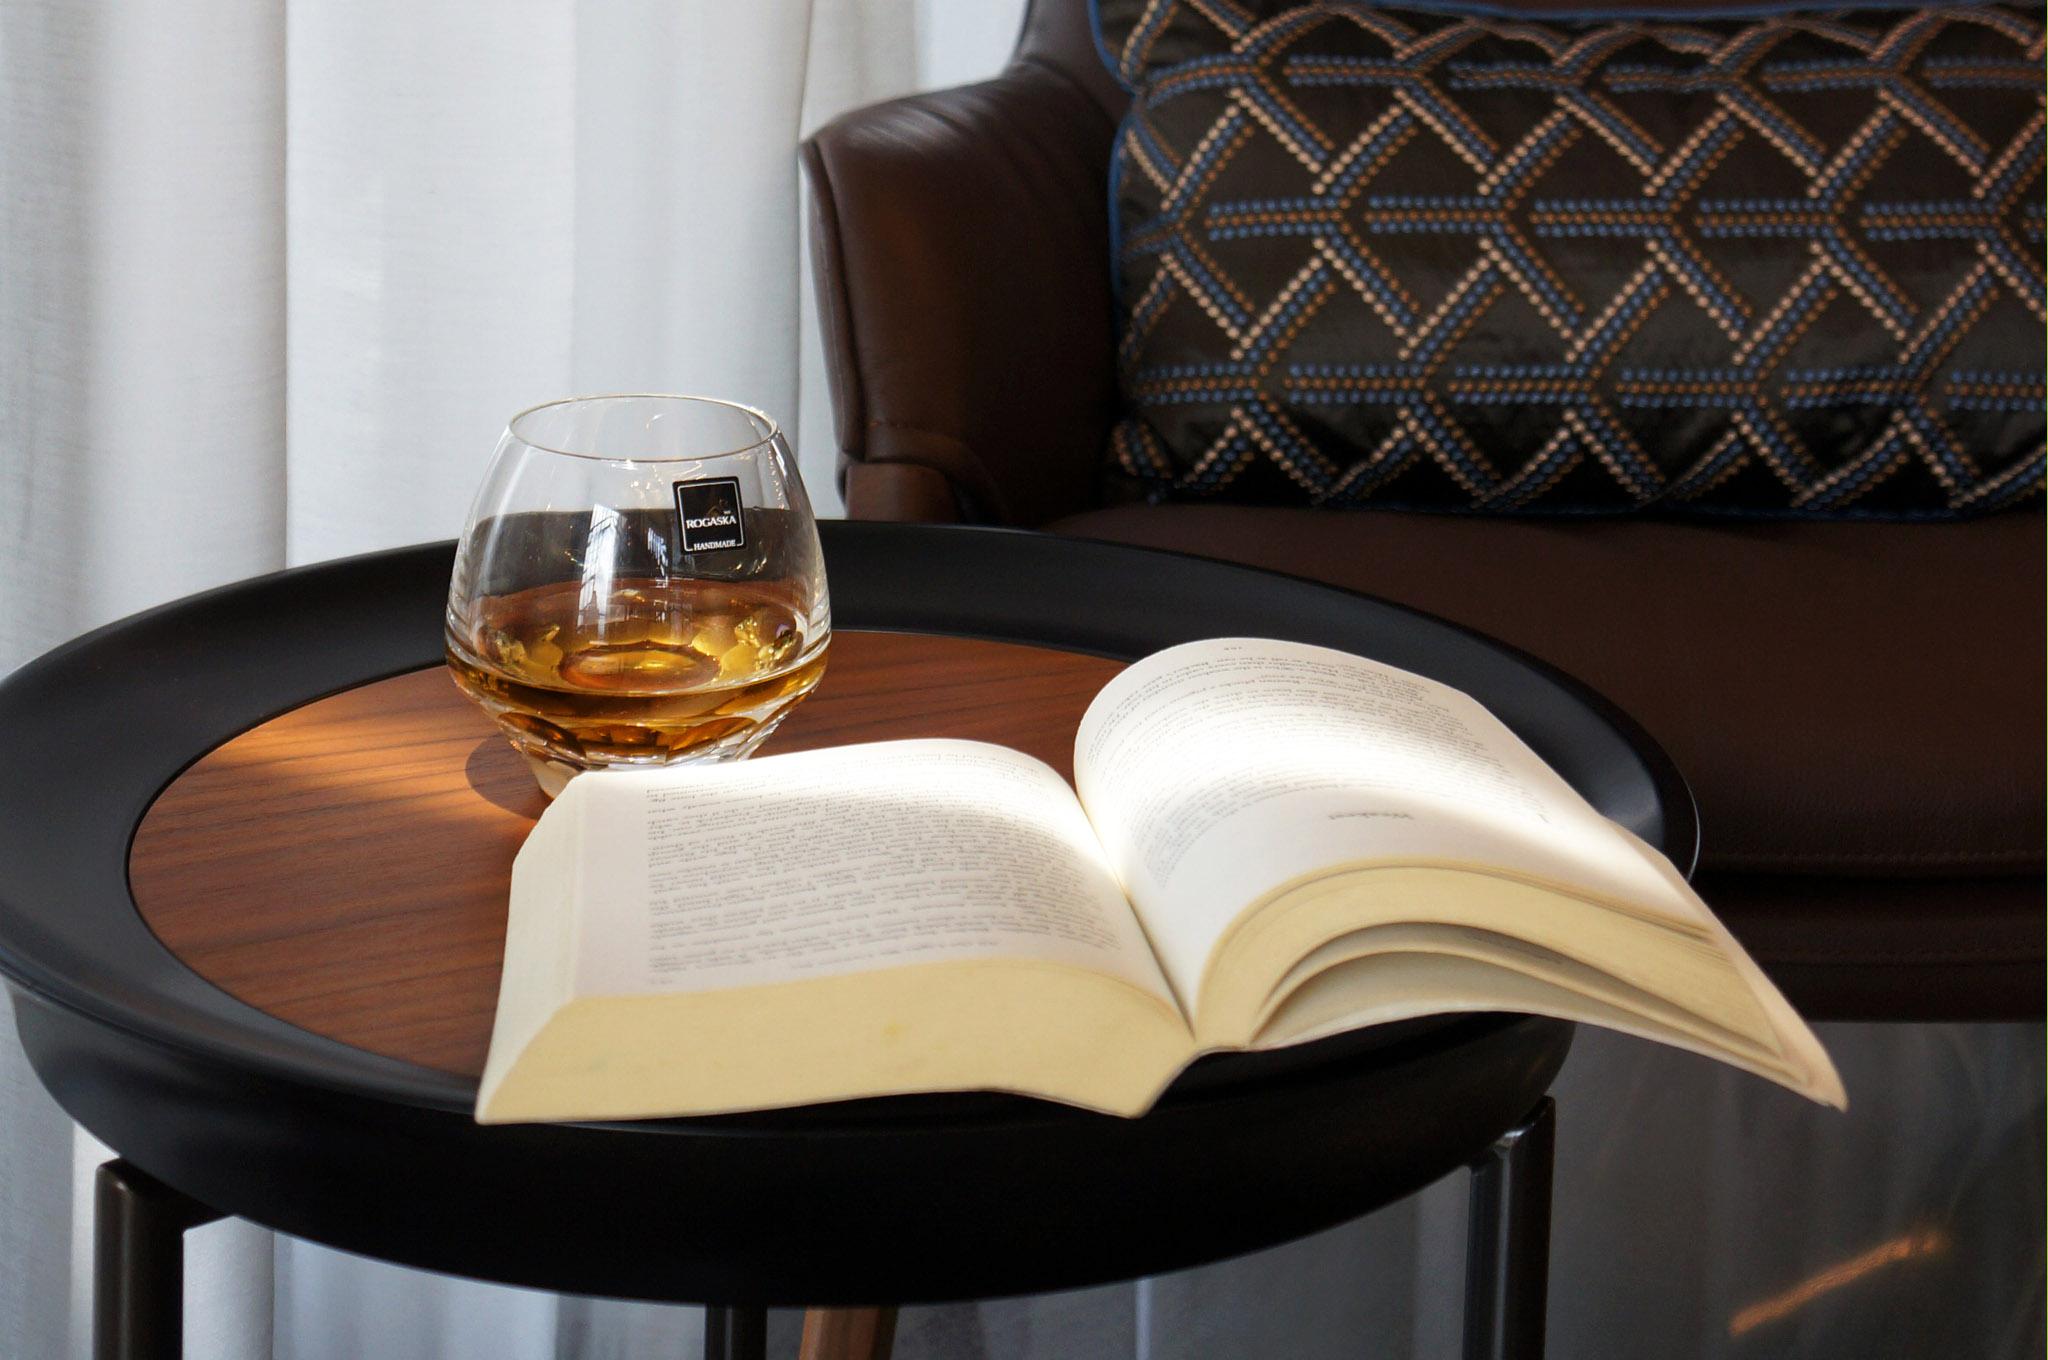 ROGASKA 水晶玻璃 BLOSSOM 華麗綻放 威士忌杯 2支裝